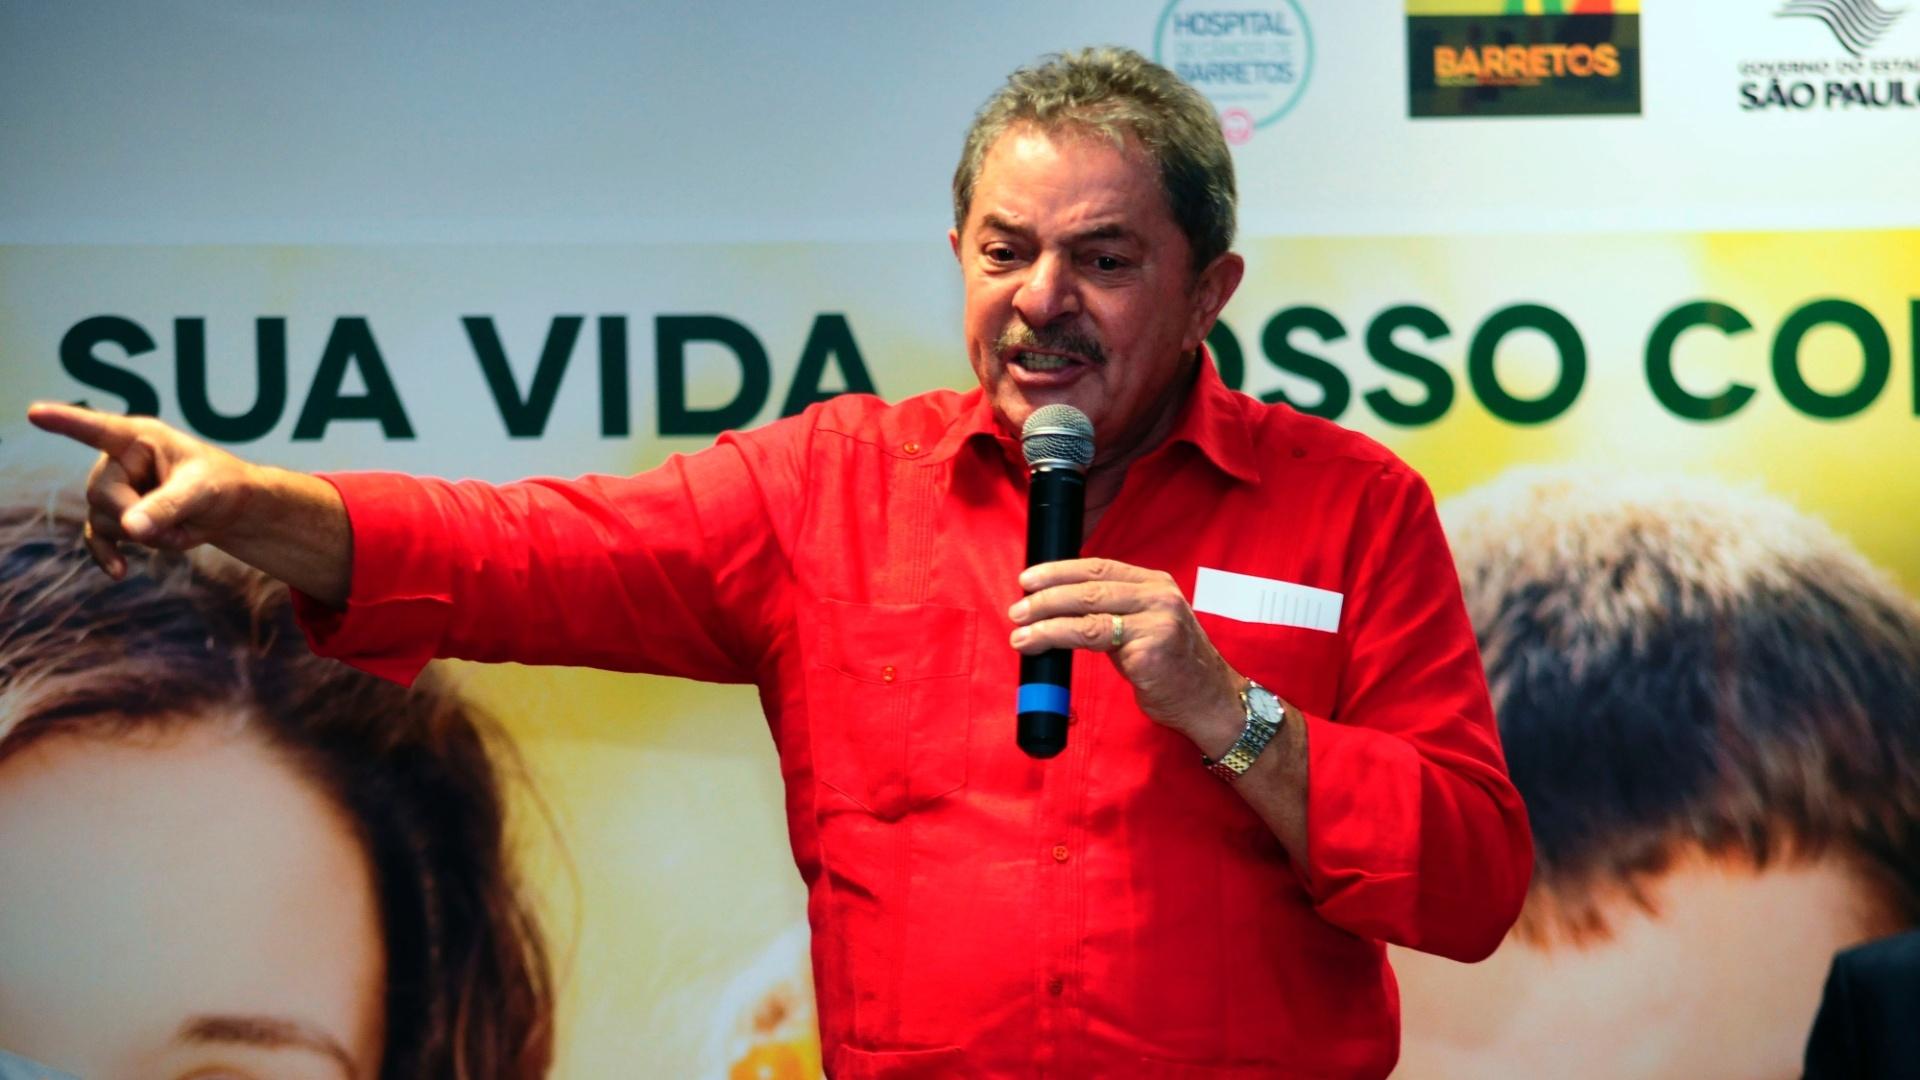 badoo portugal entrar videos de orgias